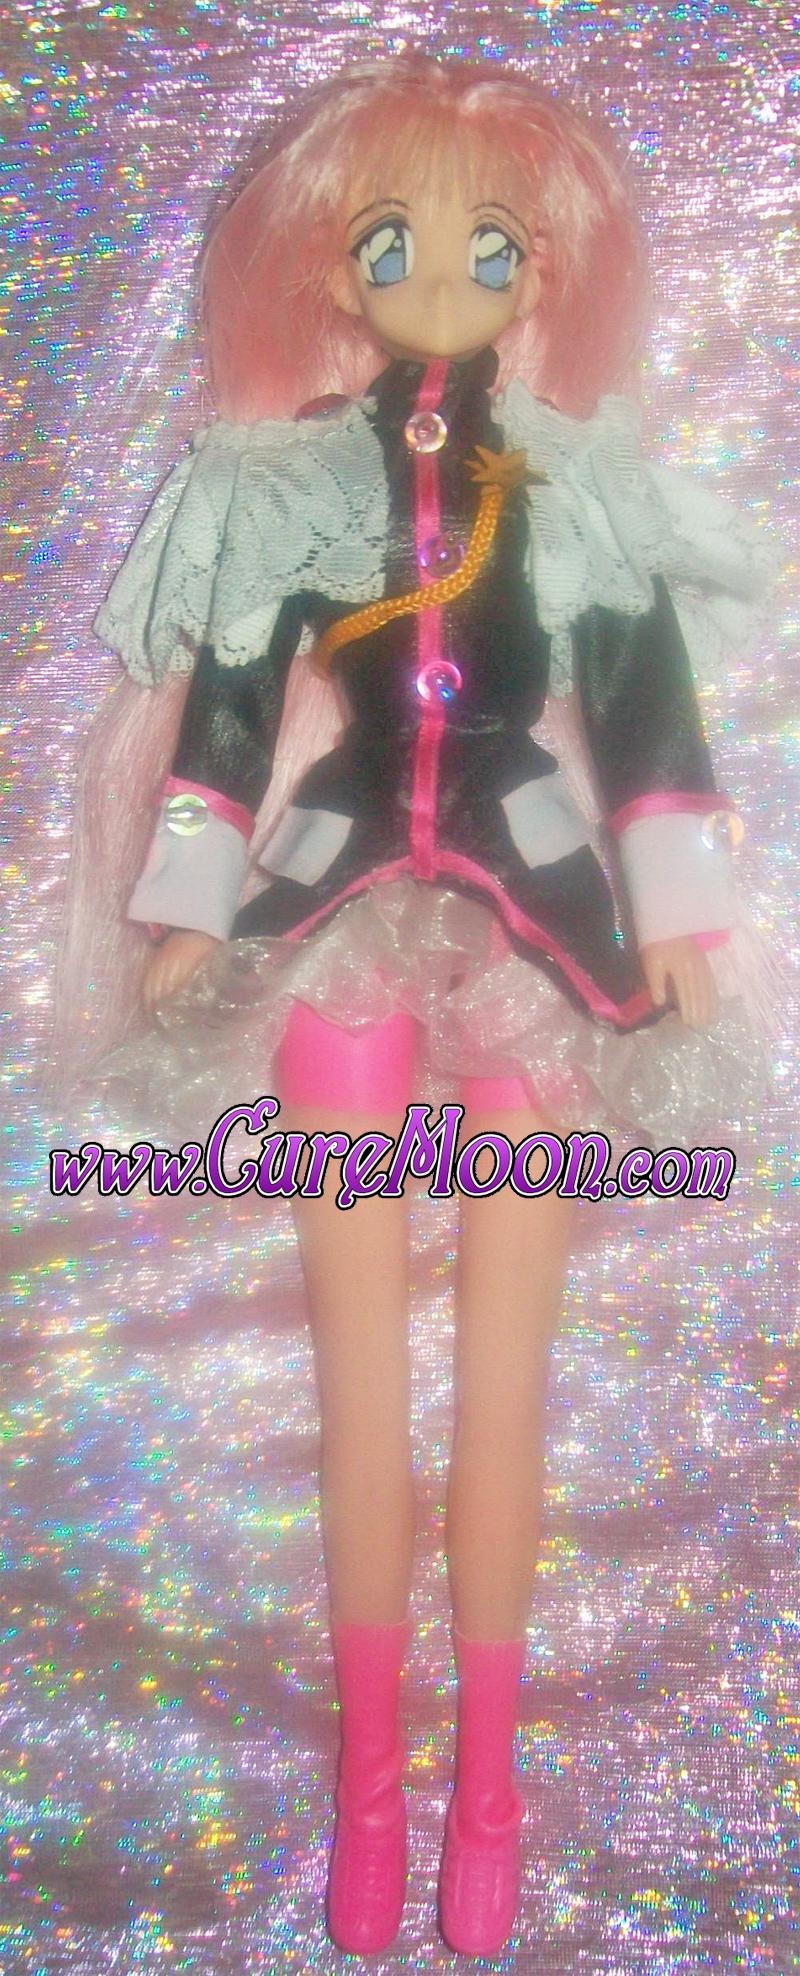 utena-revolutionary-girl-bambola-doll-custom-ooak-handmade-curemoon-bunnytsukino